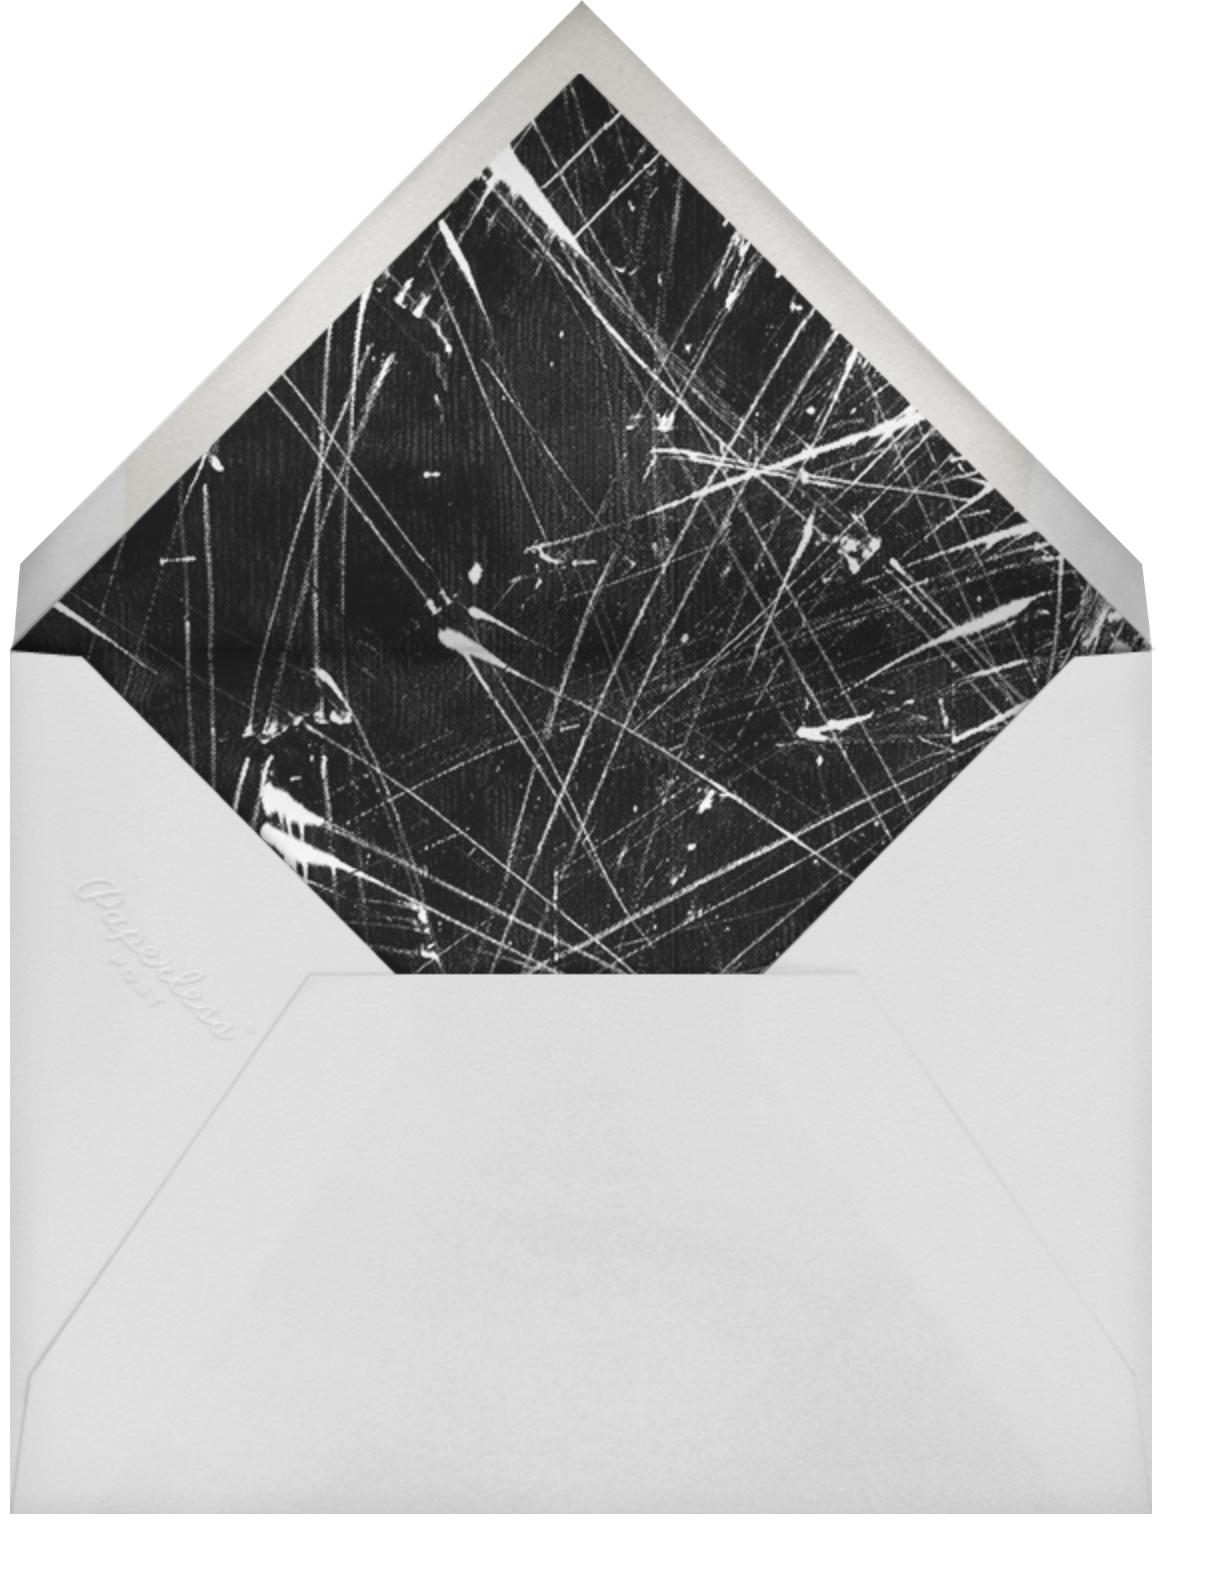 Flurry - Spruce - Kelly Wearstler - Holiday party - envelope back